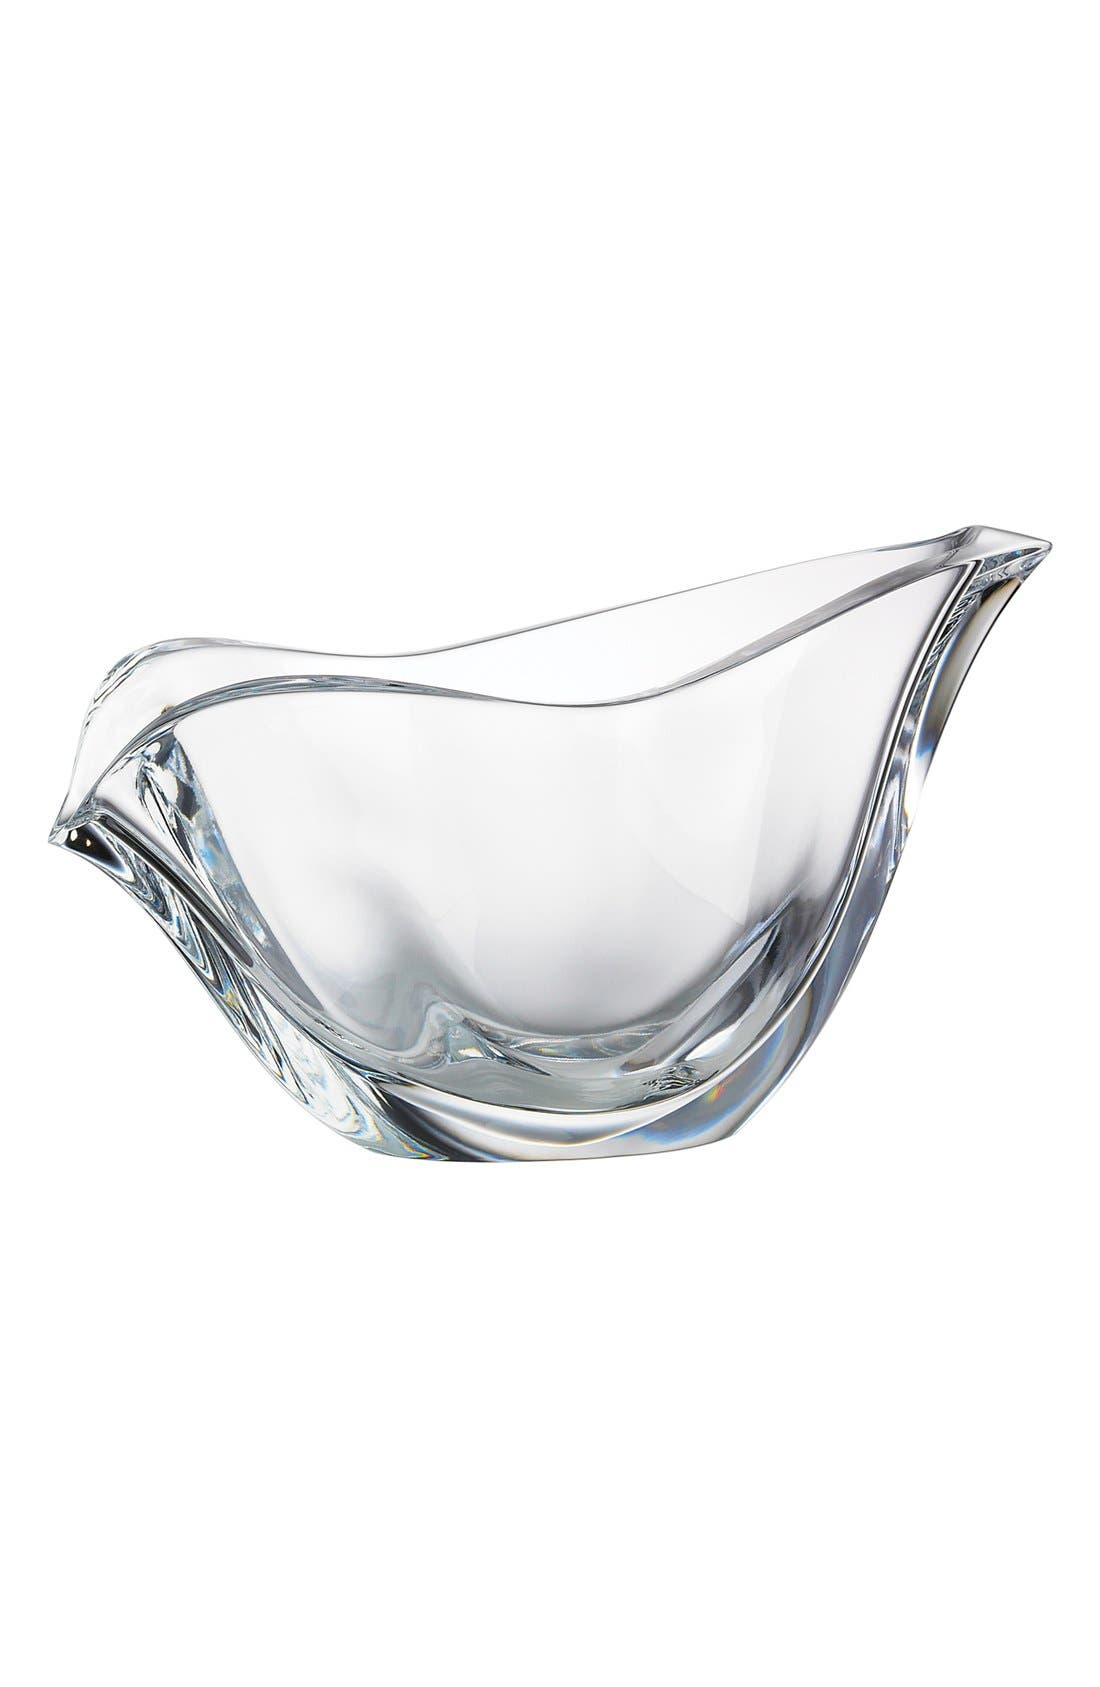 Alternate Image 1 Selected - Nambé 'Lovebirds' Bowl, Large